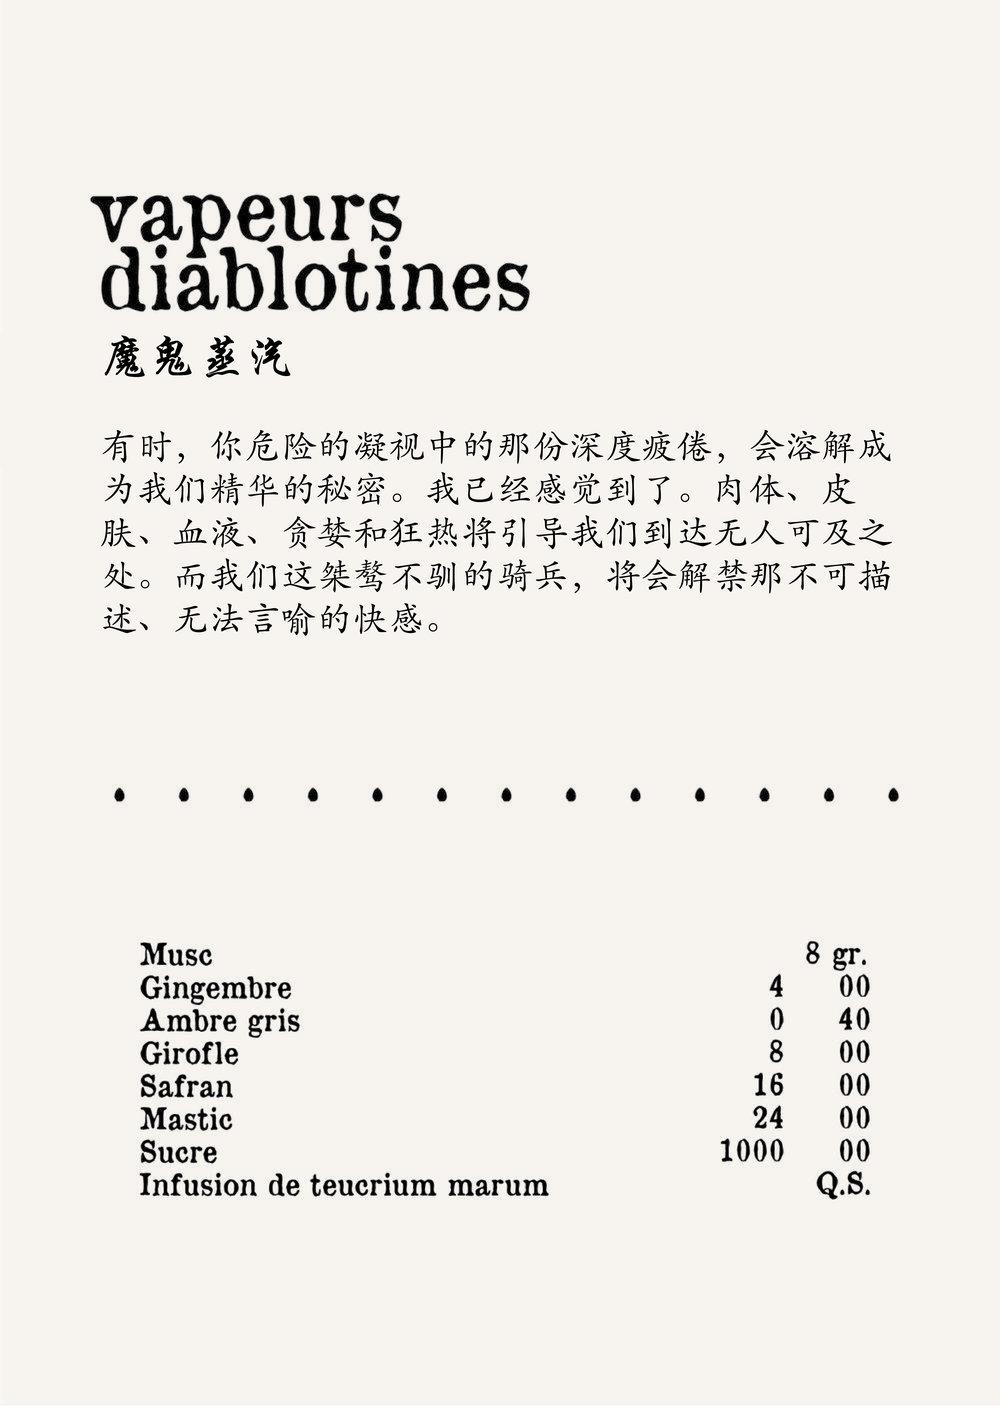 vapeurs diablotines recipe